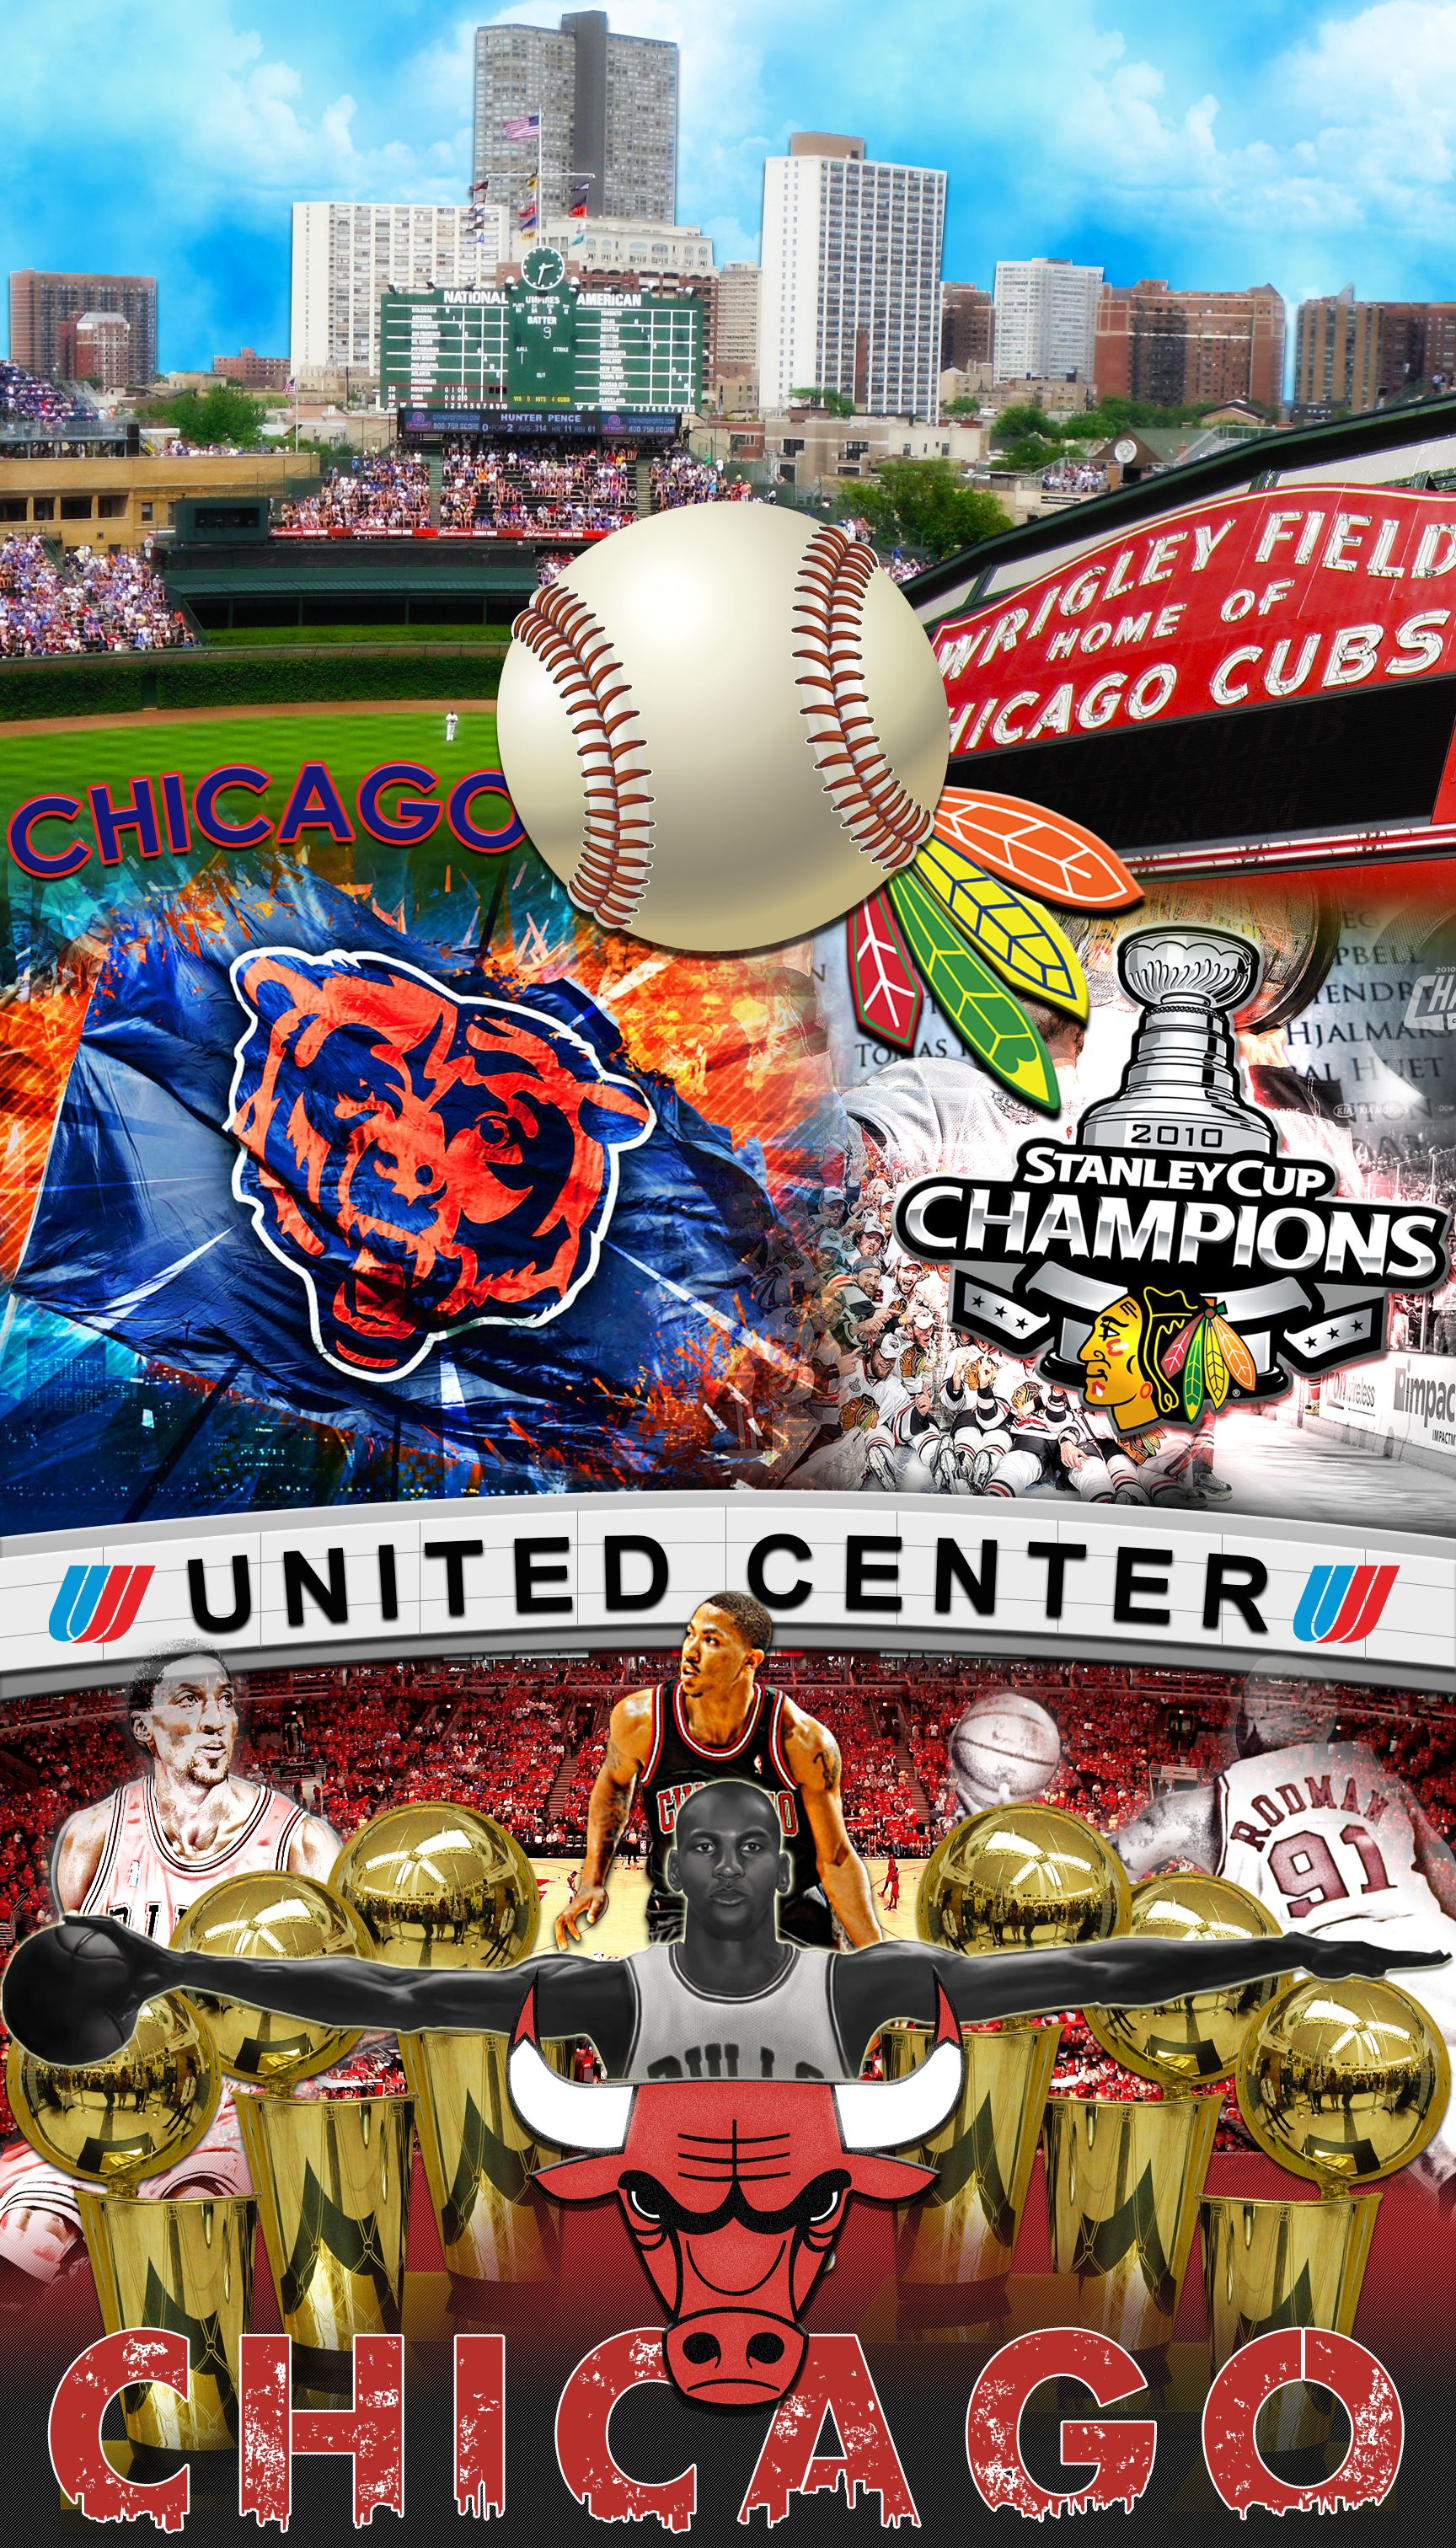 Chicago Sports Cornhole Decal Chicago Bulls Chicago Bears Chicago Black Hawks And Chicago Cubs Bean Bag T Cornhole Decals Cornhole Stickers Chicago Sports [ 3024 x 1728 Pixel ]